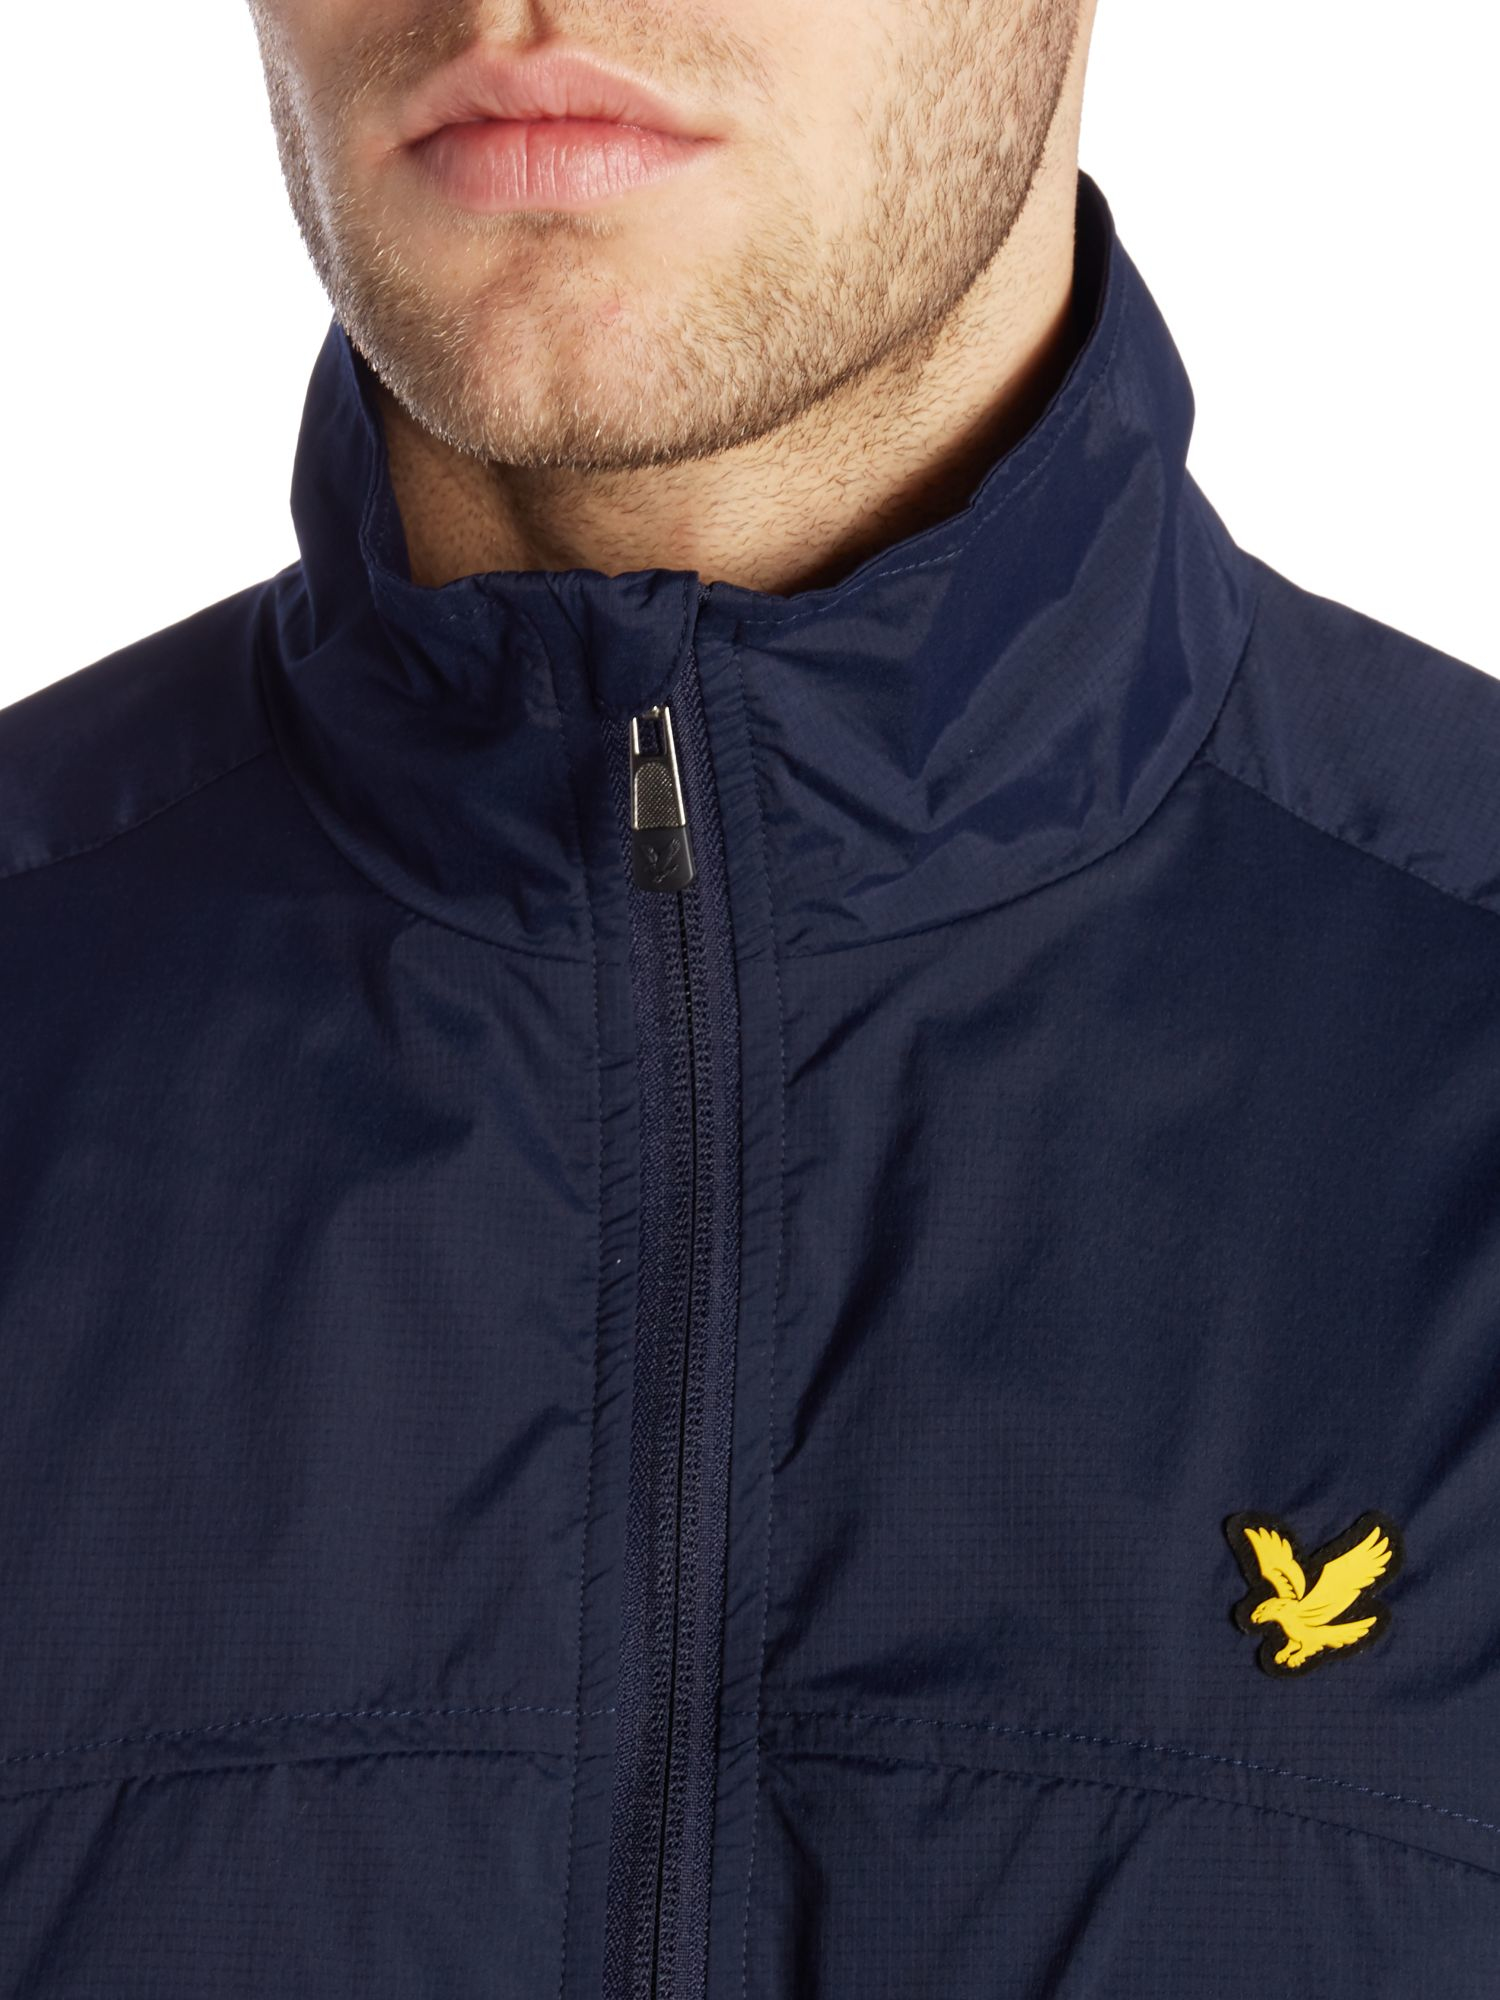 Lyle & Scott Sports Full Zip-through Jacket in Navy (Blue) for Men